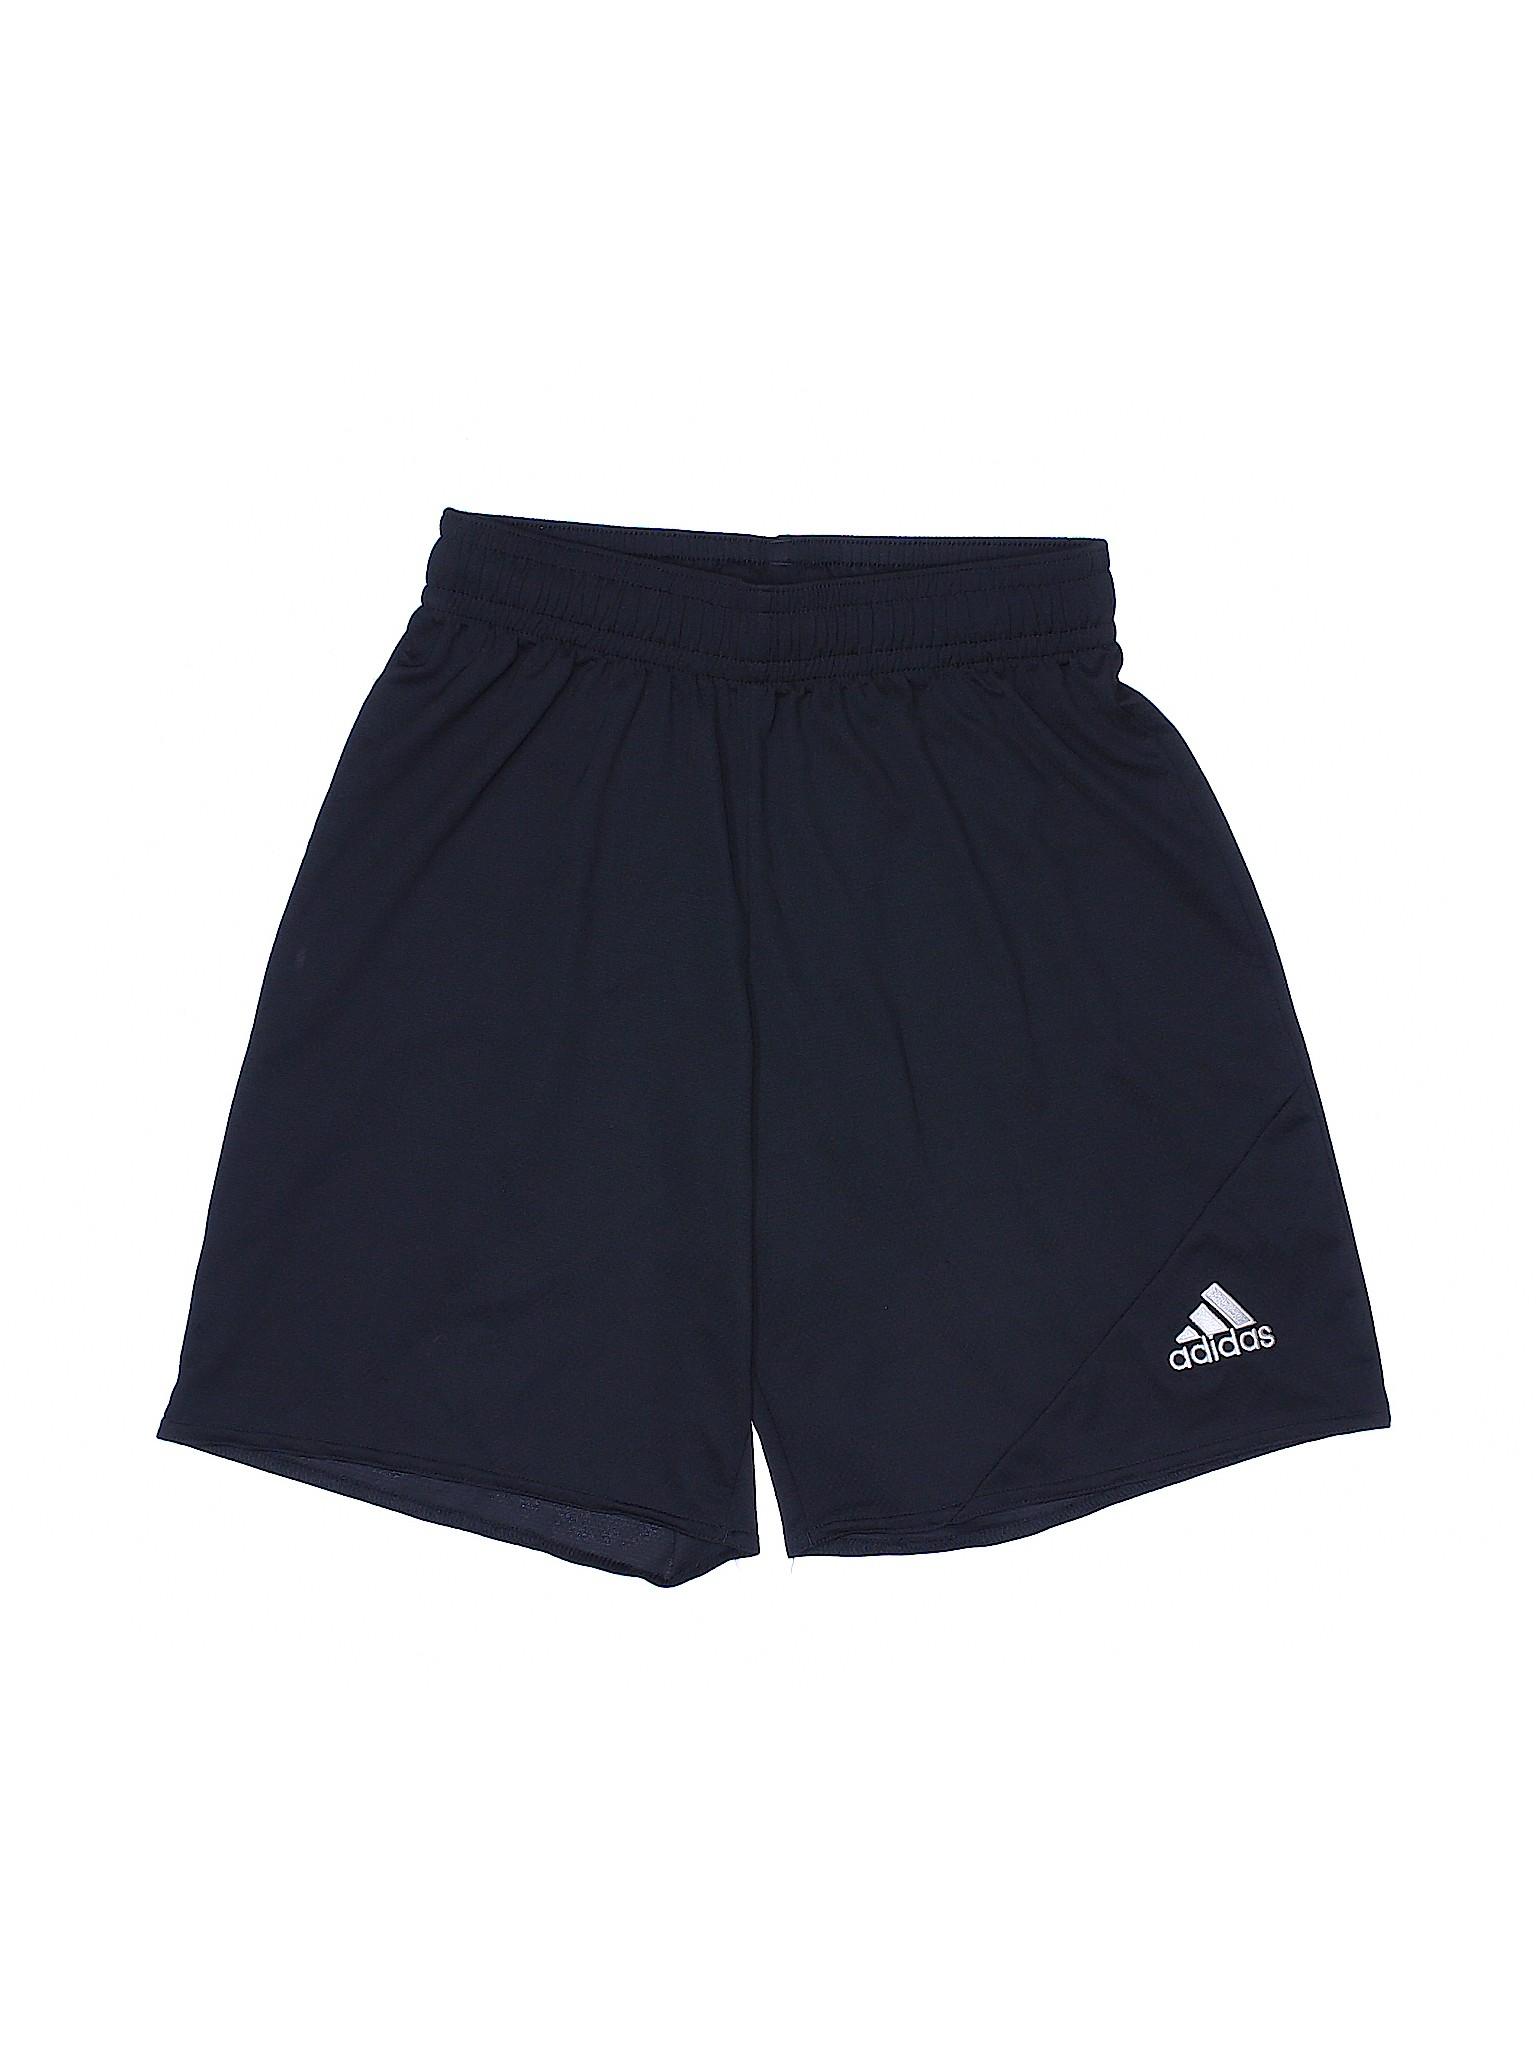 Athletic Shorts Shorts Adidas Adidas Athletic Adidas Athletic Boutique Boutique Boutique Adidas Boutique Shorts Boutique Athletic Adidas Shorts AtFqpcwn